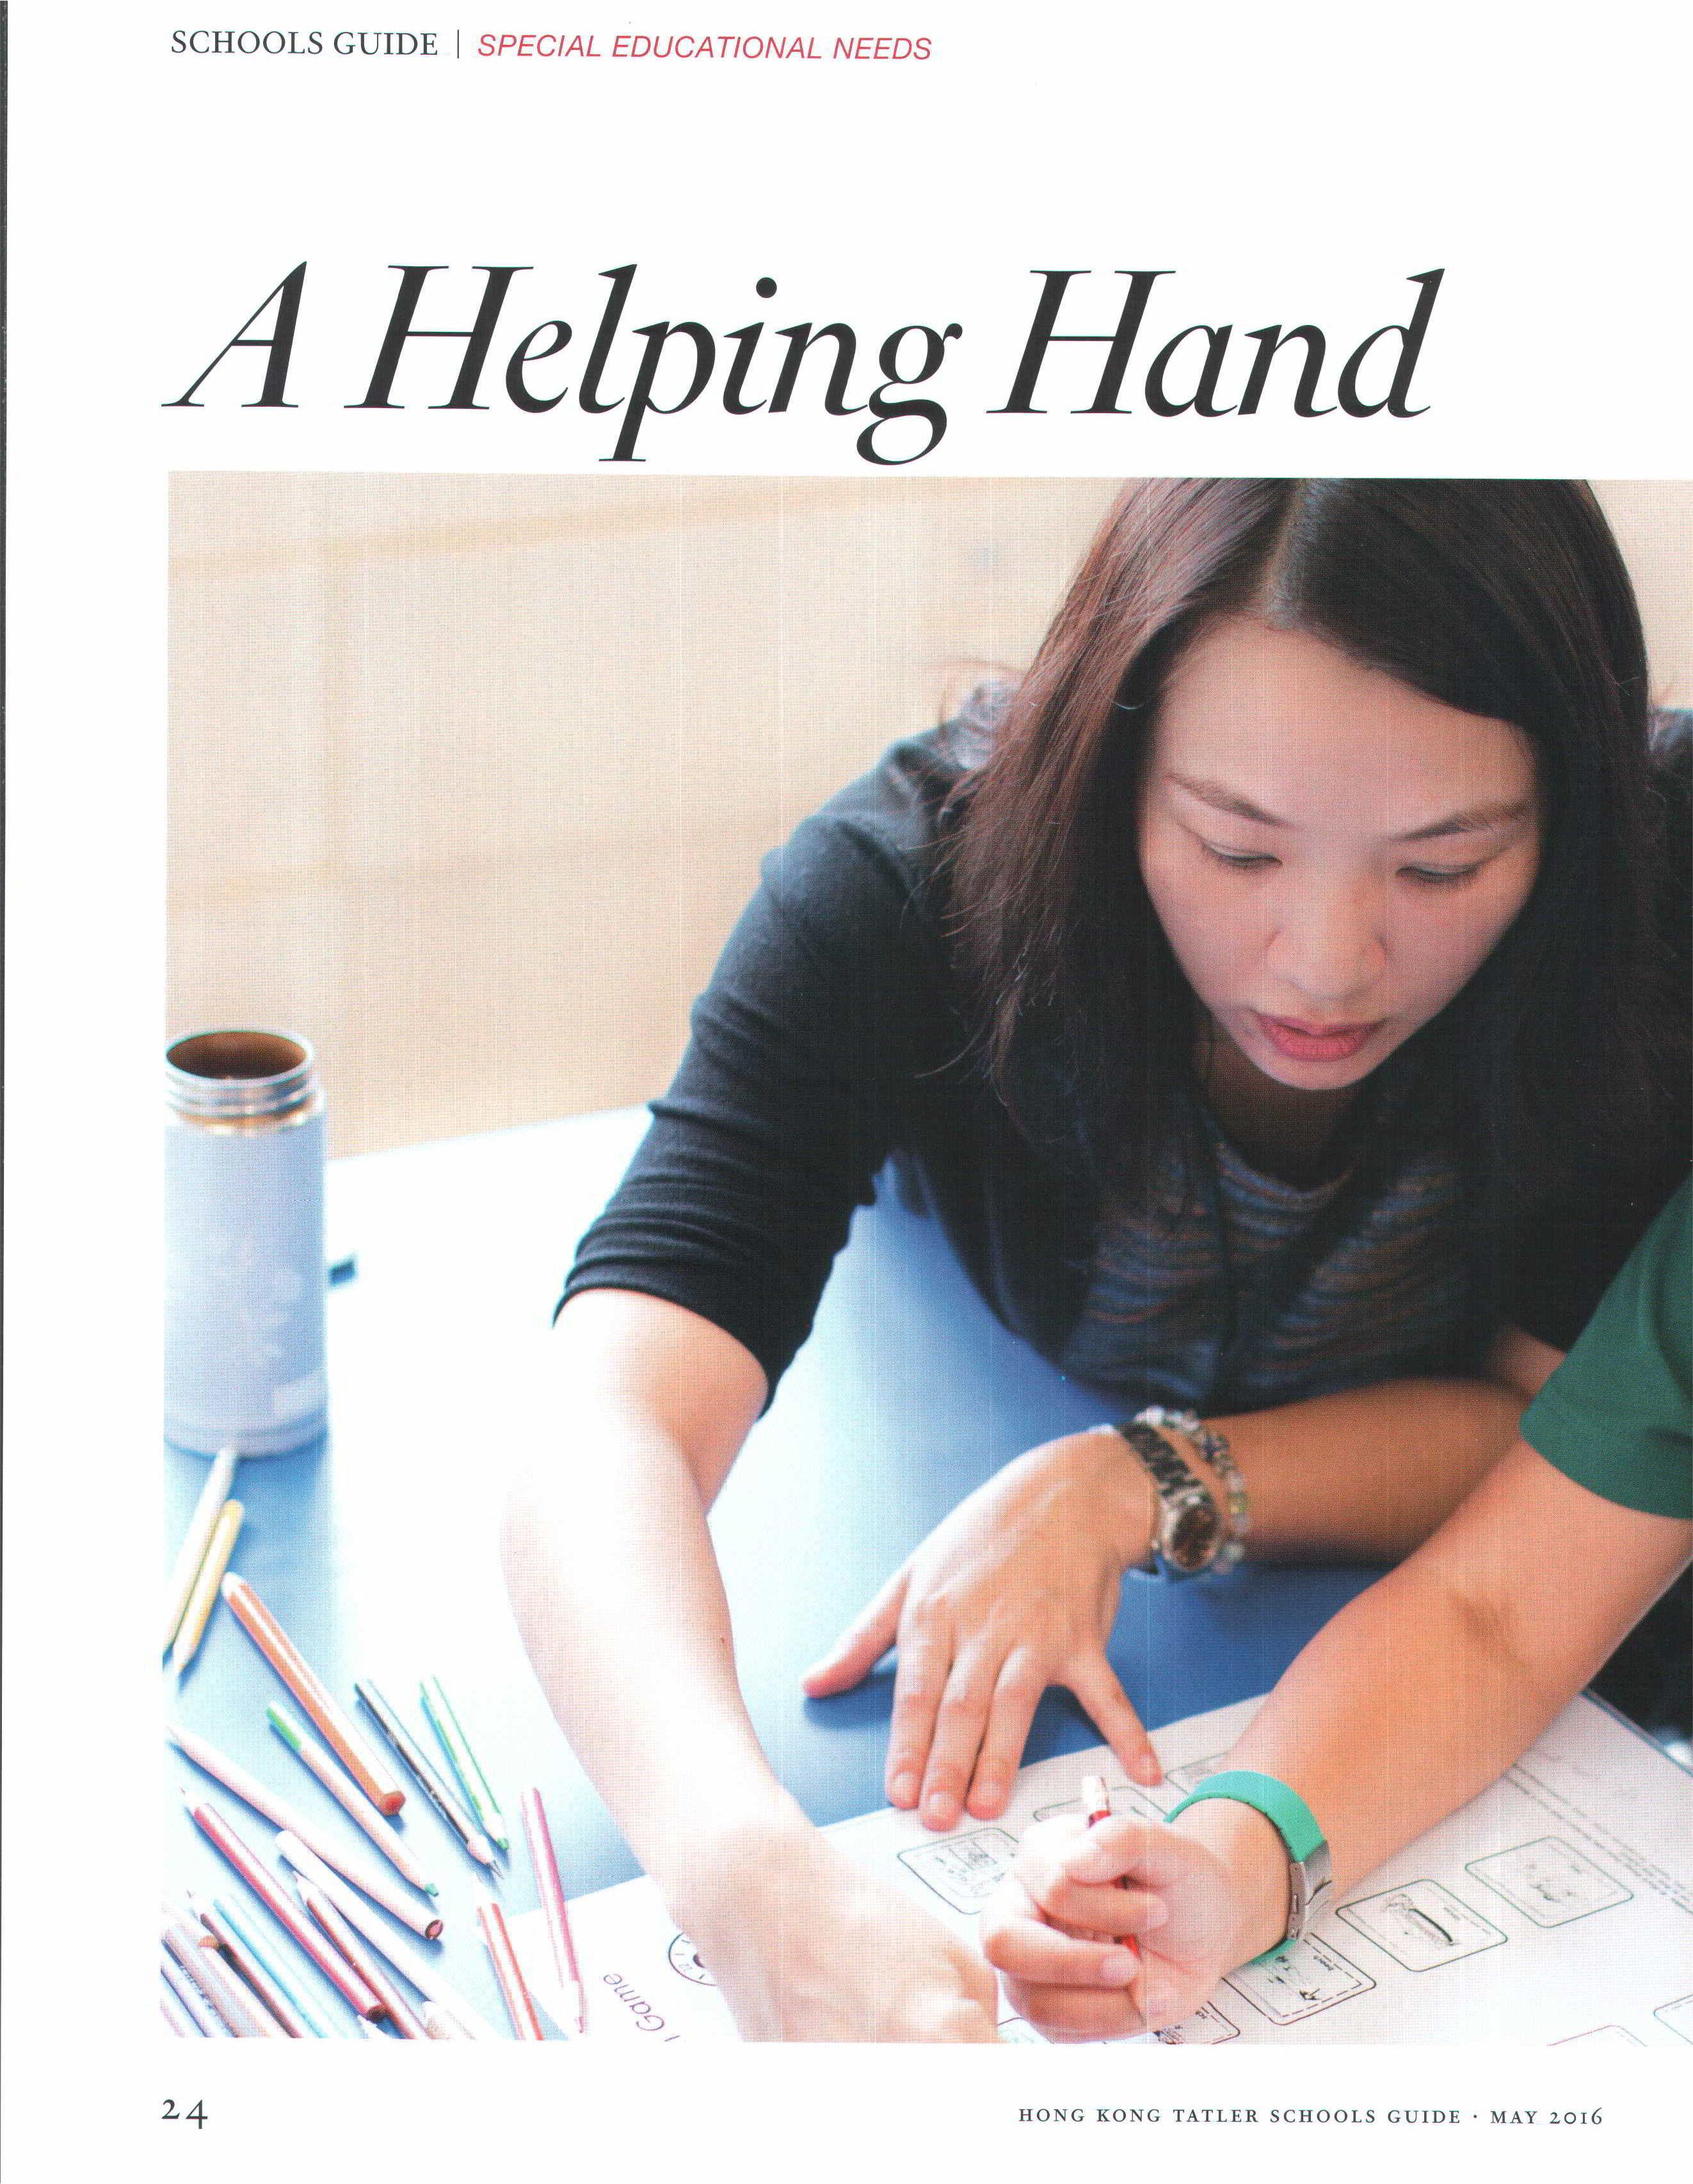 Hong Kong Tatler - A helping hand - autism partnership